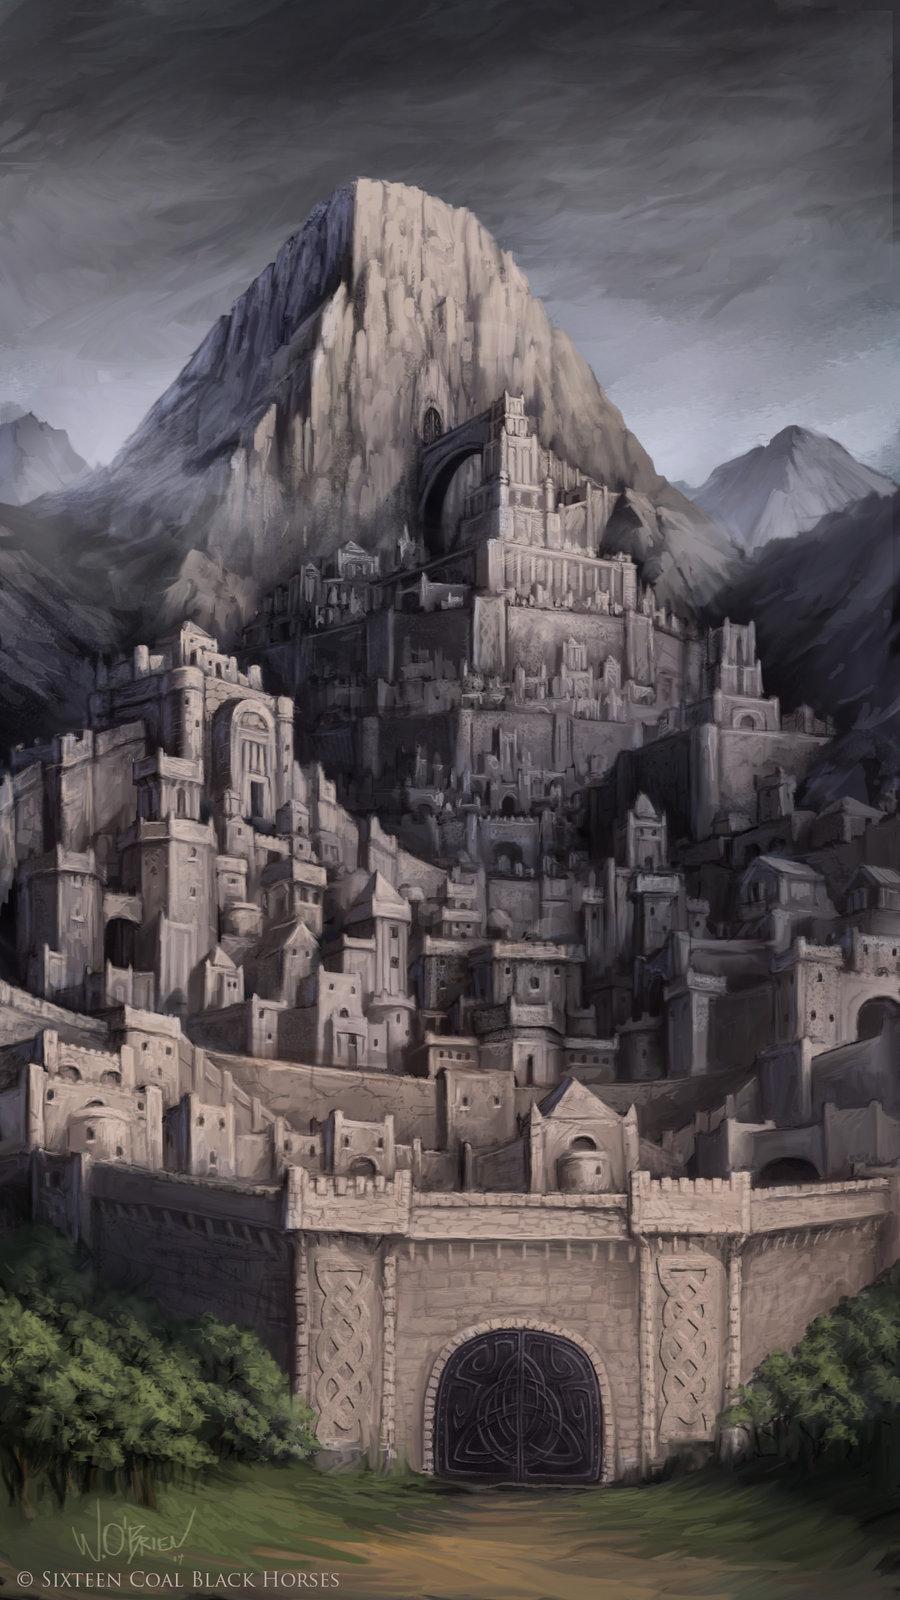 battle_axe__iron_fortress_by_willobrien-d8a47ej.jpg